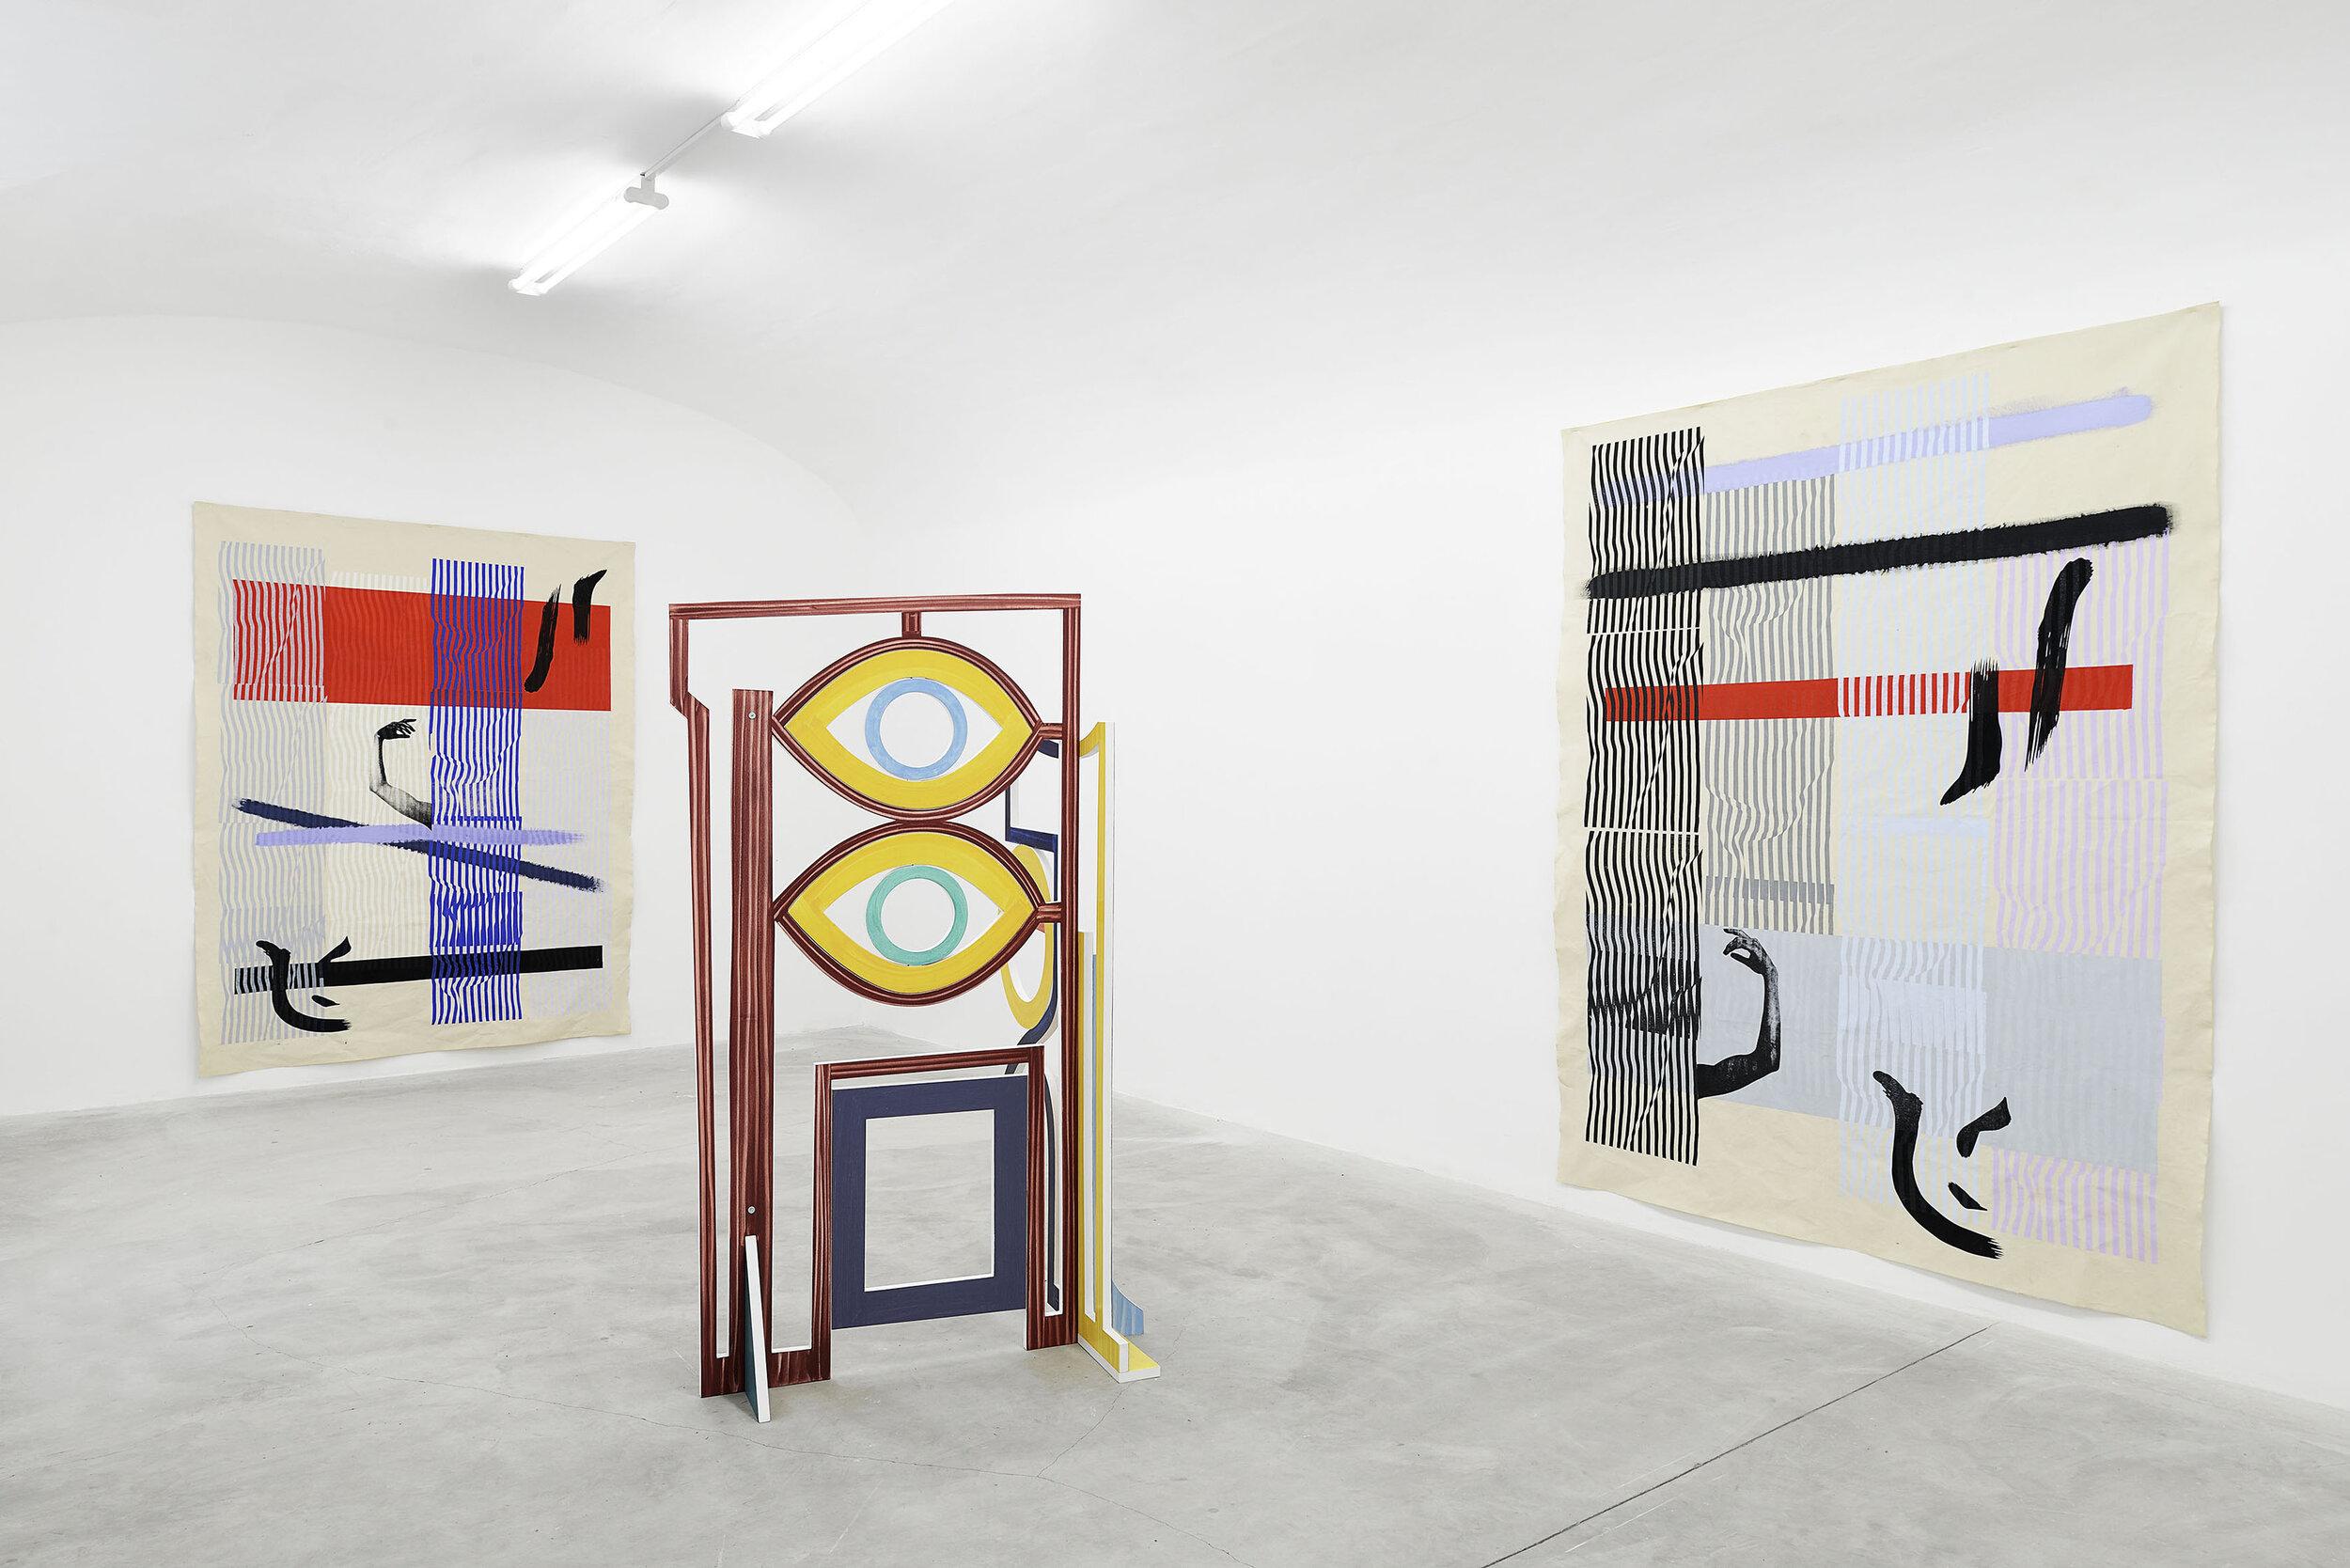 Jacopo Miliani, Fay Nicolson, Jackson Sprague .  Frutta, Rome, IT, 2015